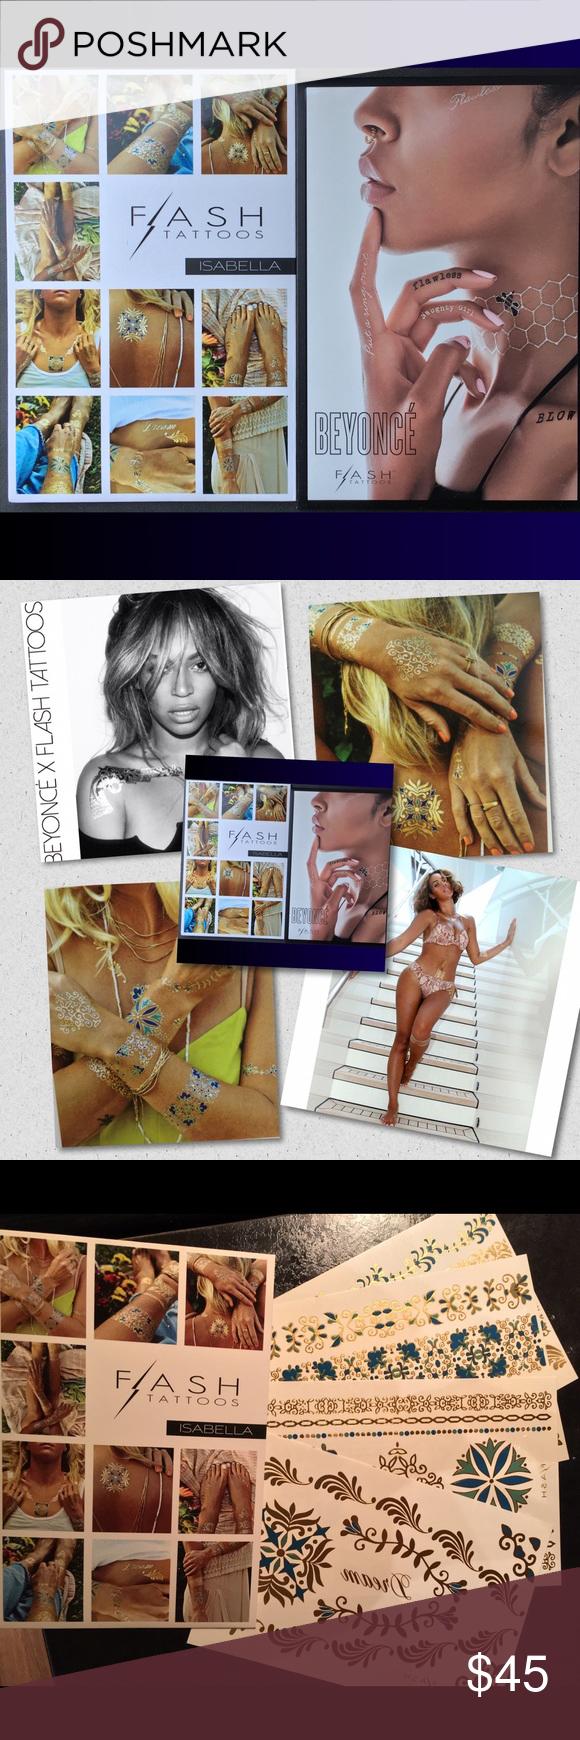 SOLD!! Beyoncé/Isabella Bundle of Flash Tats; | Flash tats ...